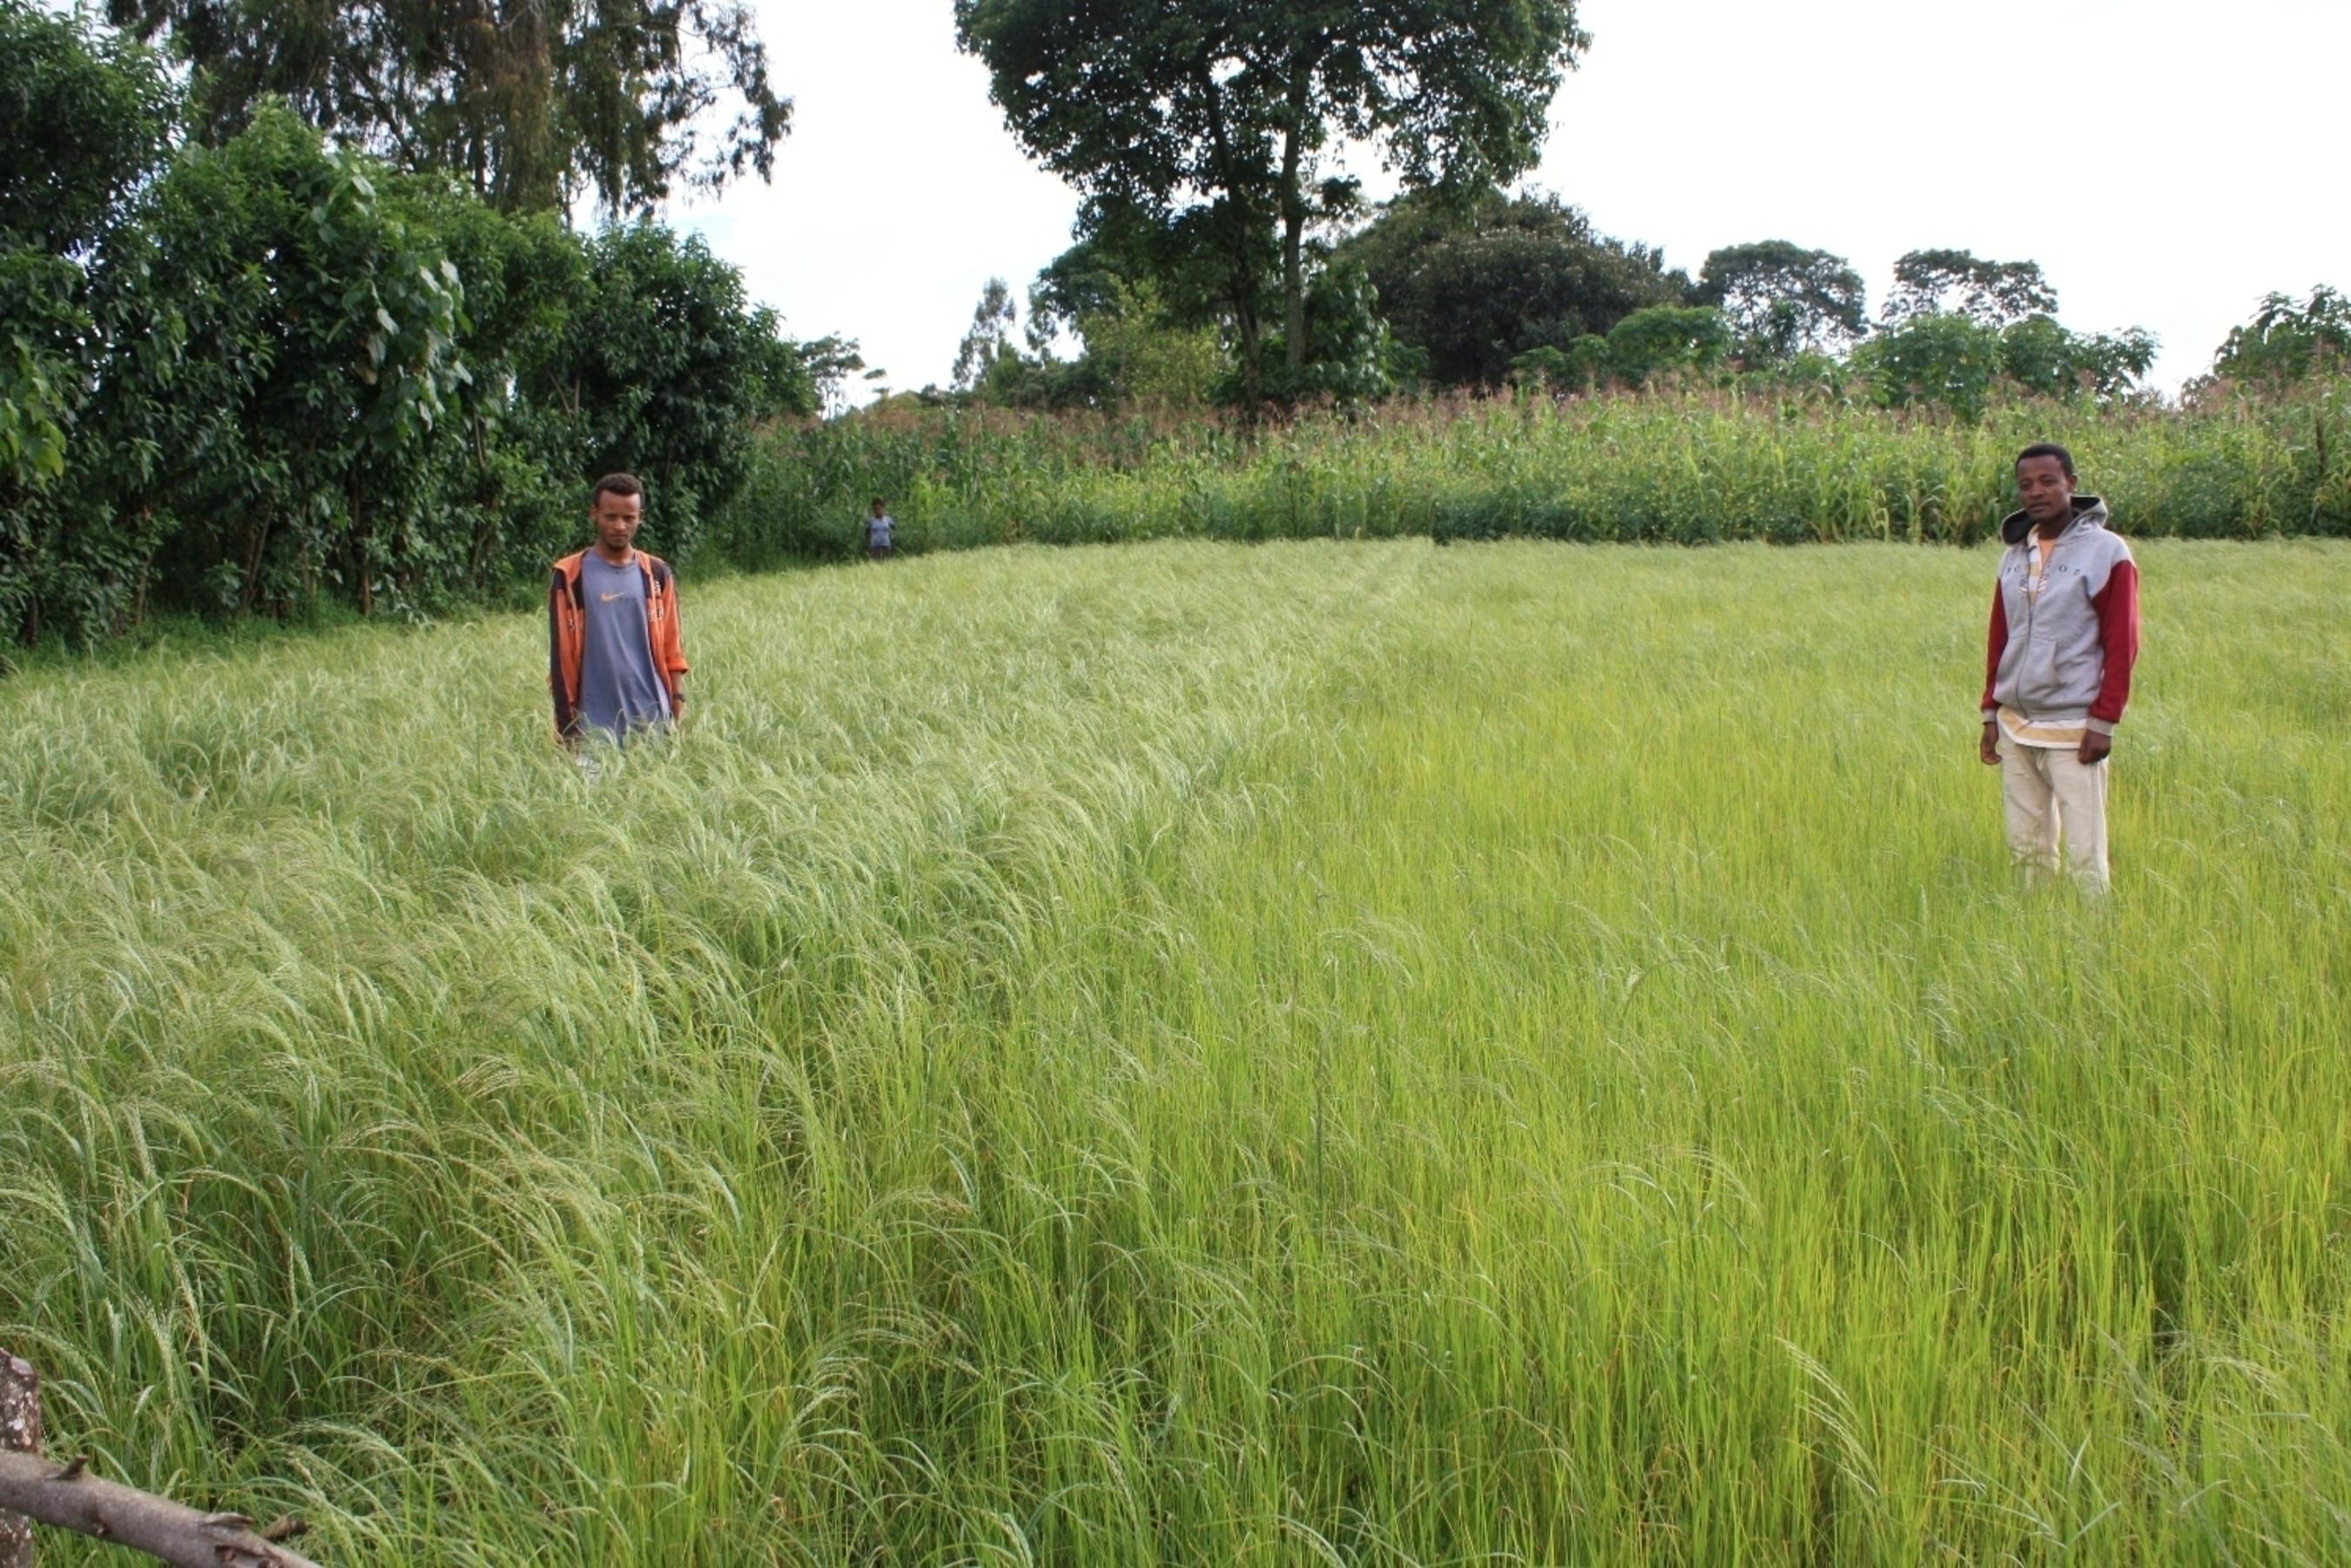 Potash demonstration plot in teff crop at Lekemt, Oromia region, Ethiopia. Left side: with potash application; right side: without potash application. Photo taken by Eldad Sokolowski, Agronomist, ICL Fertilizers (PRNewsFoto/ICL)